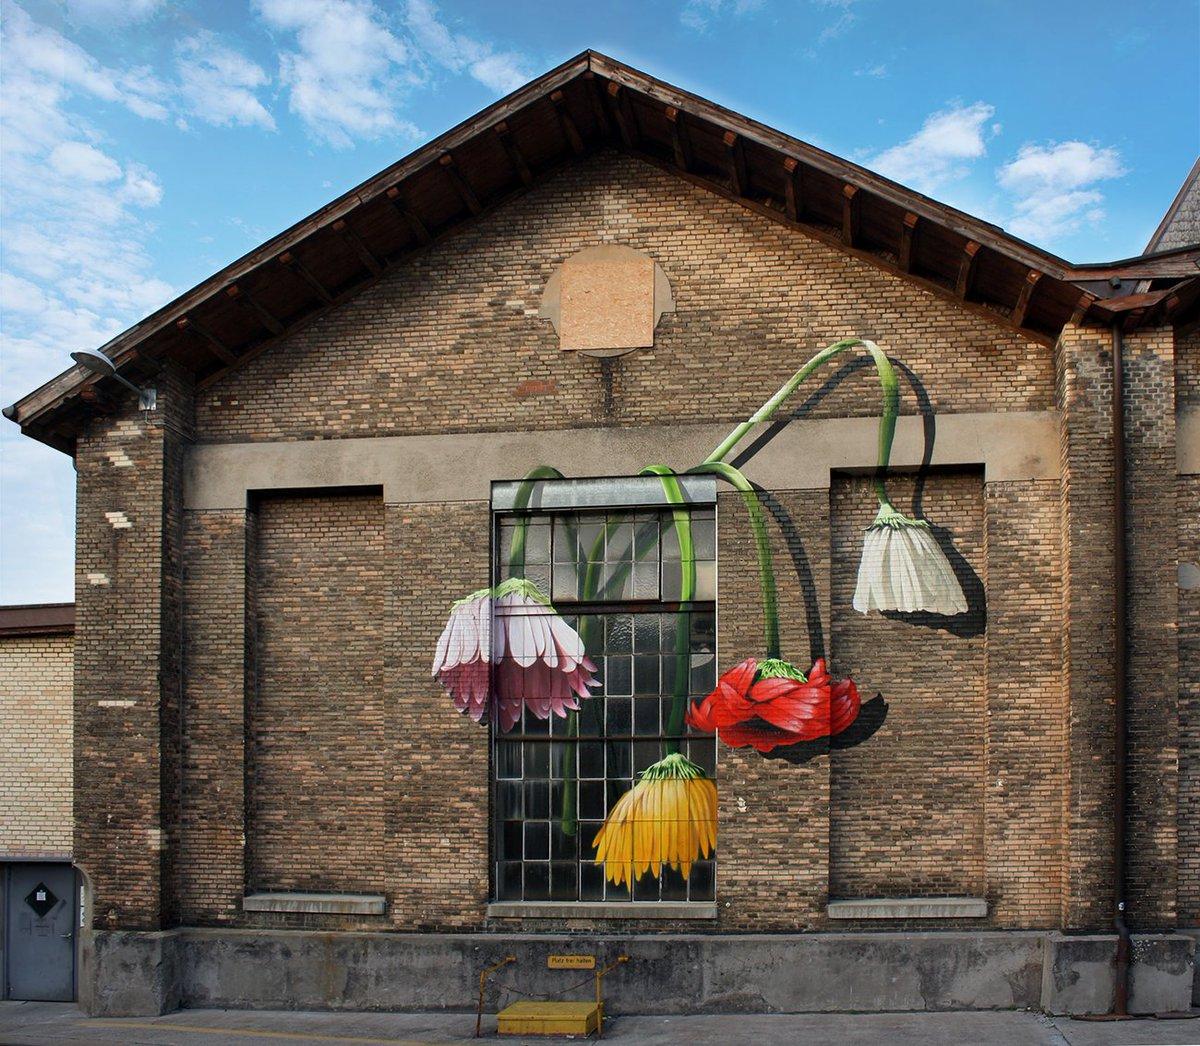 #art #streetart #mural &quot;Wall Flowers&quot; By Chromeo in Wintherthur, Swiss <br>http://pic.twitter.com/tFwzeklMVo